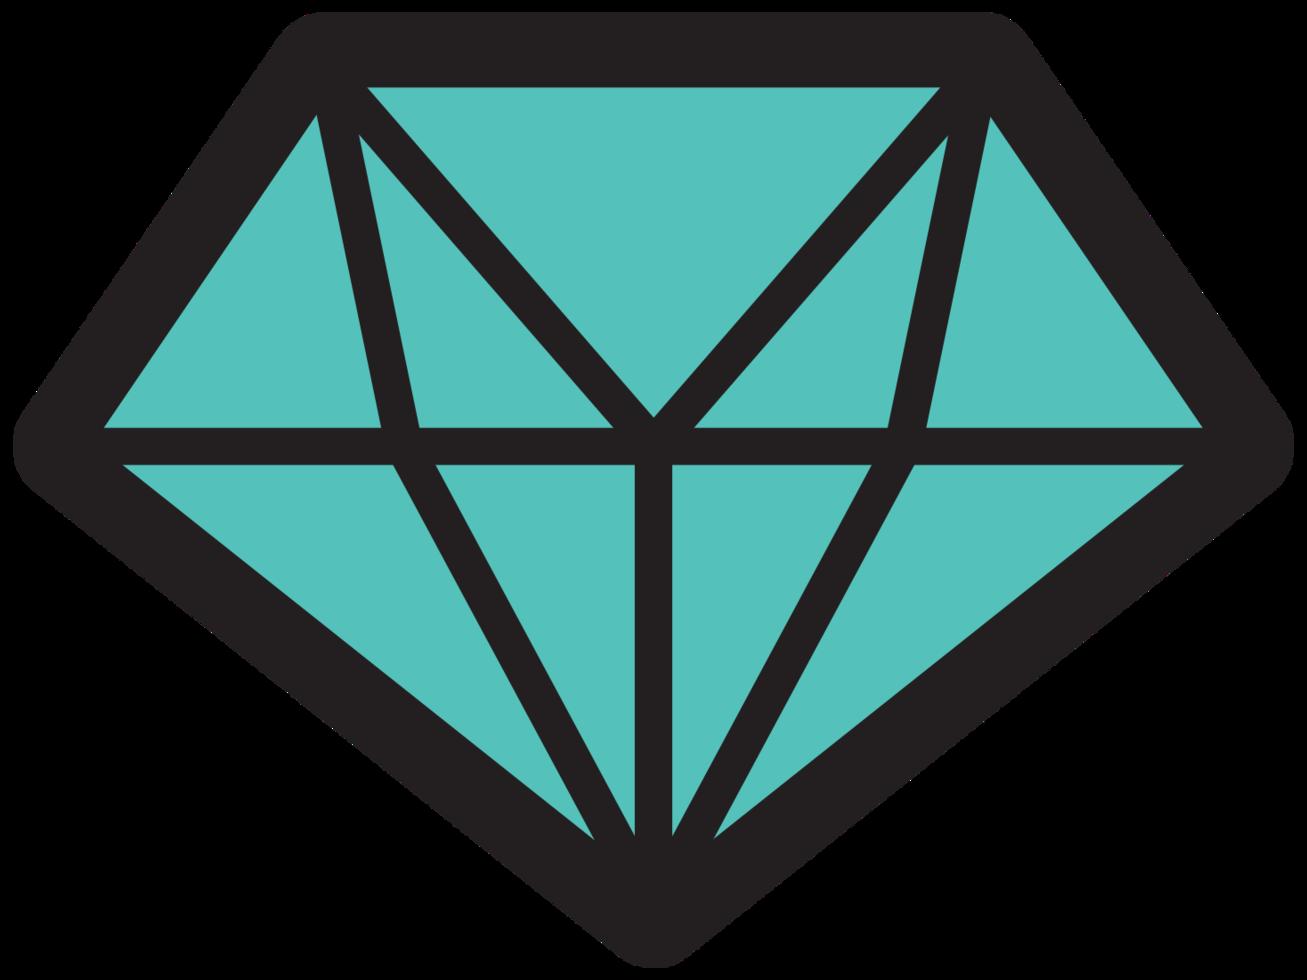 diamant steen png